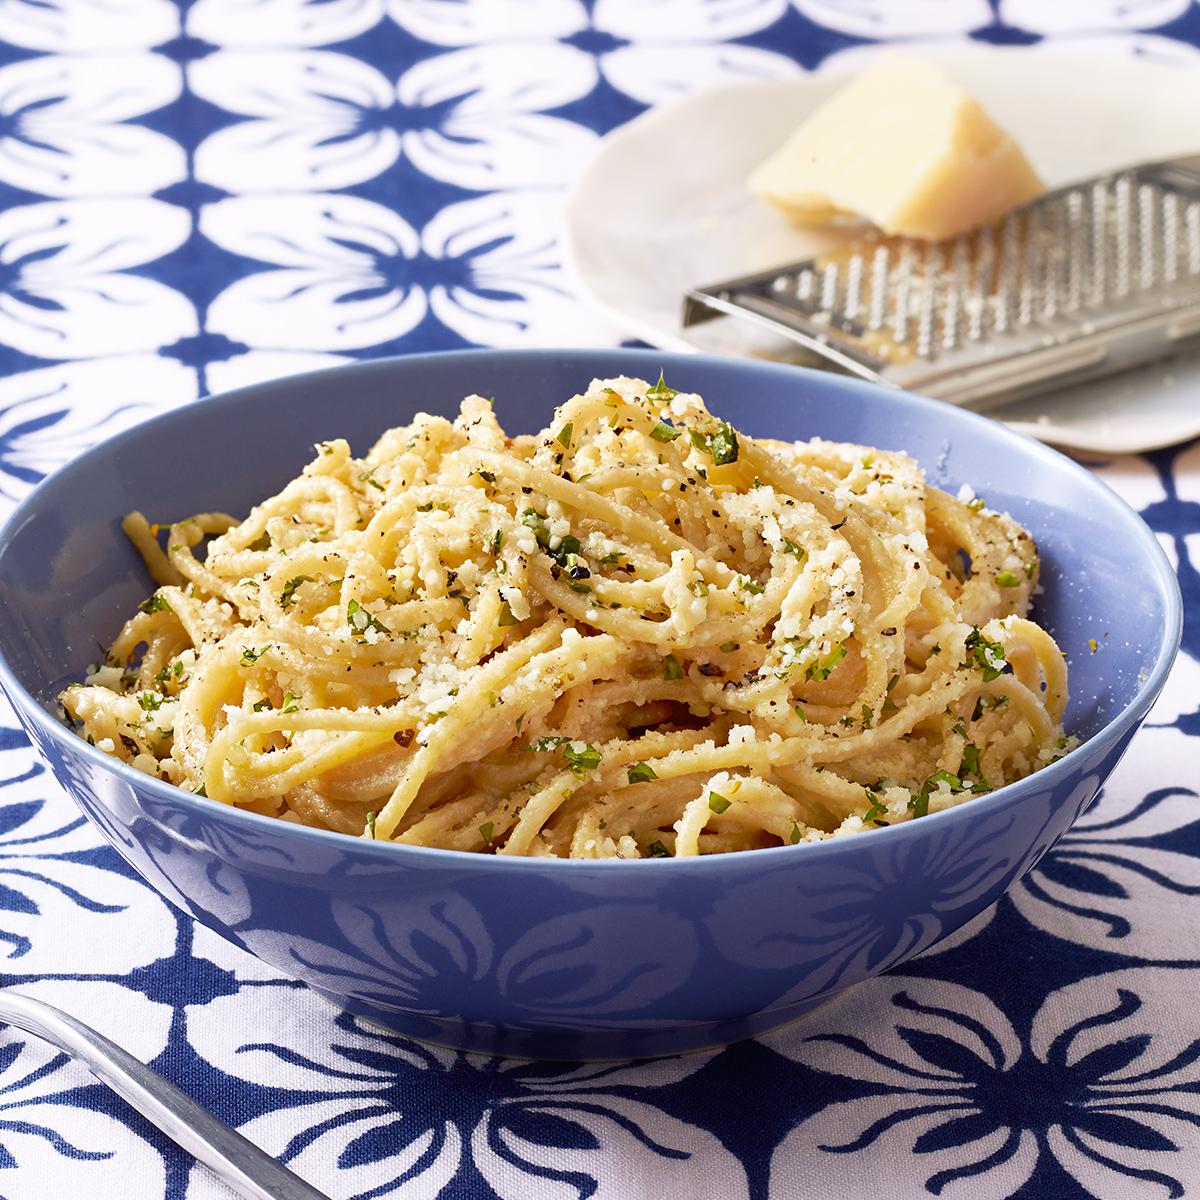 Lemon-Tarragon Parm Pasta